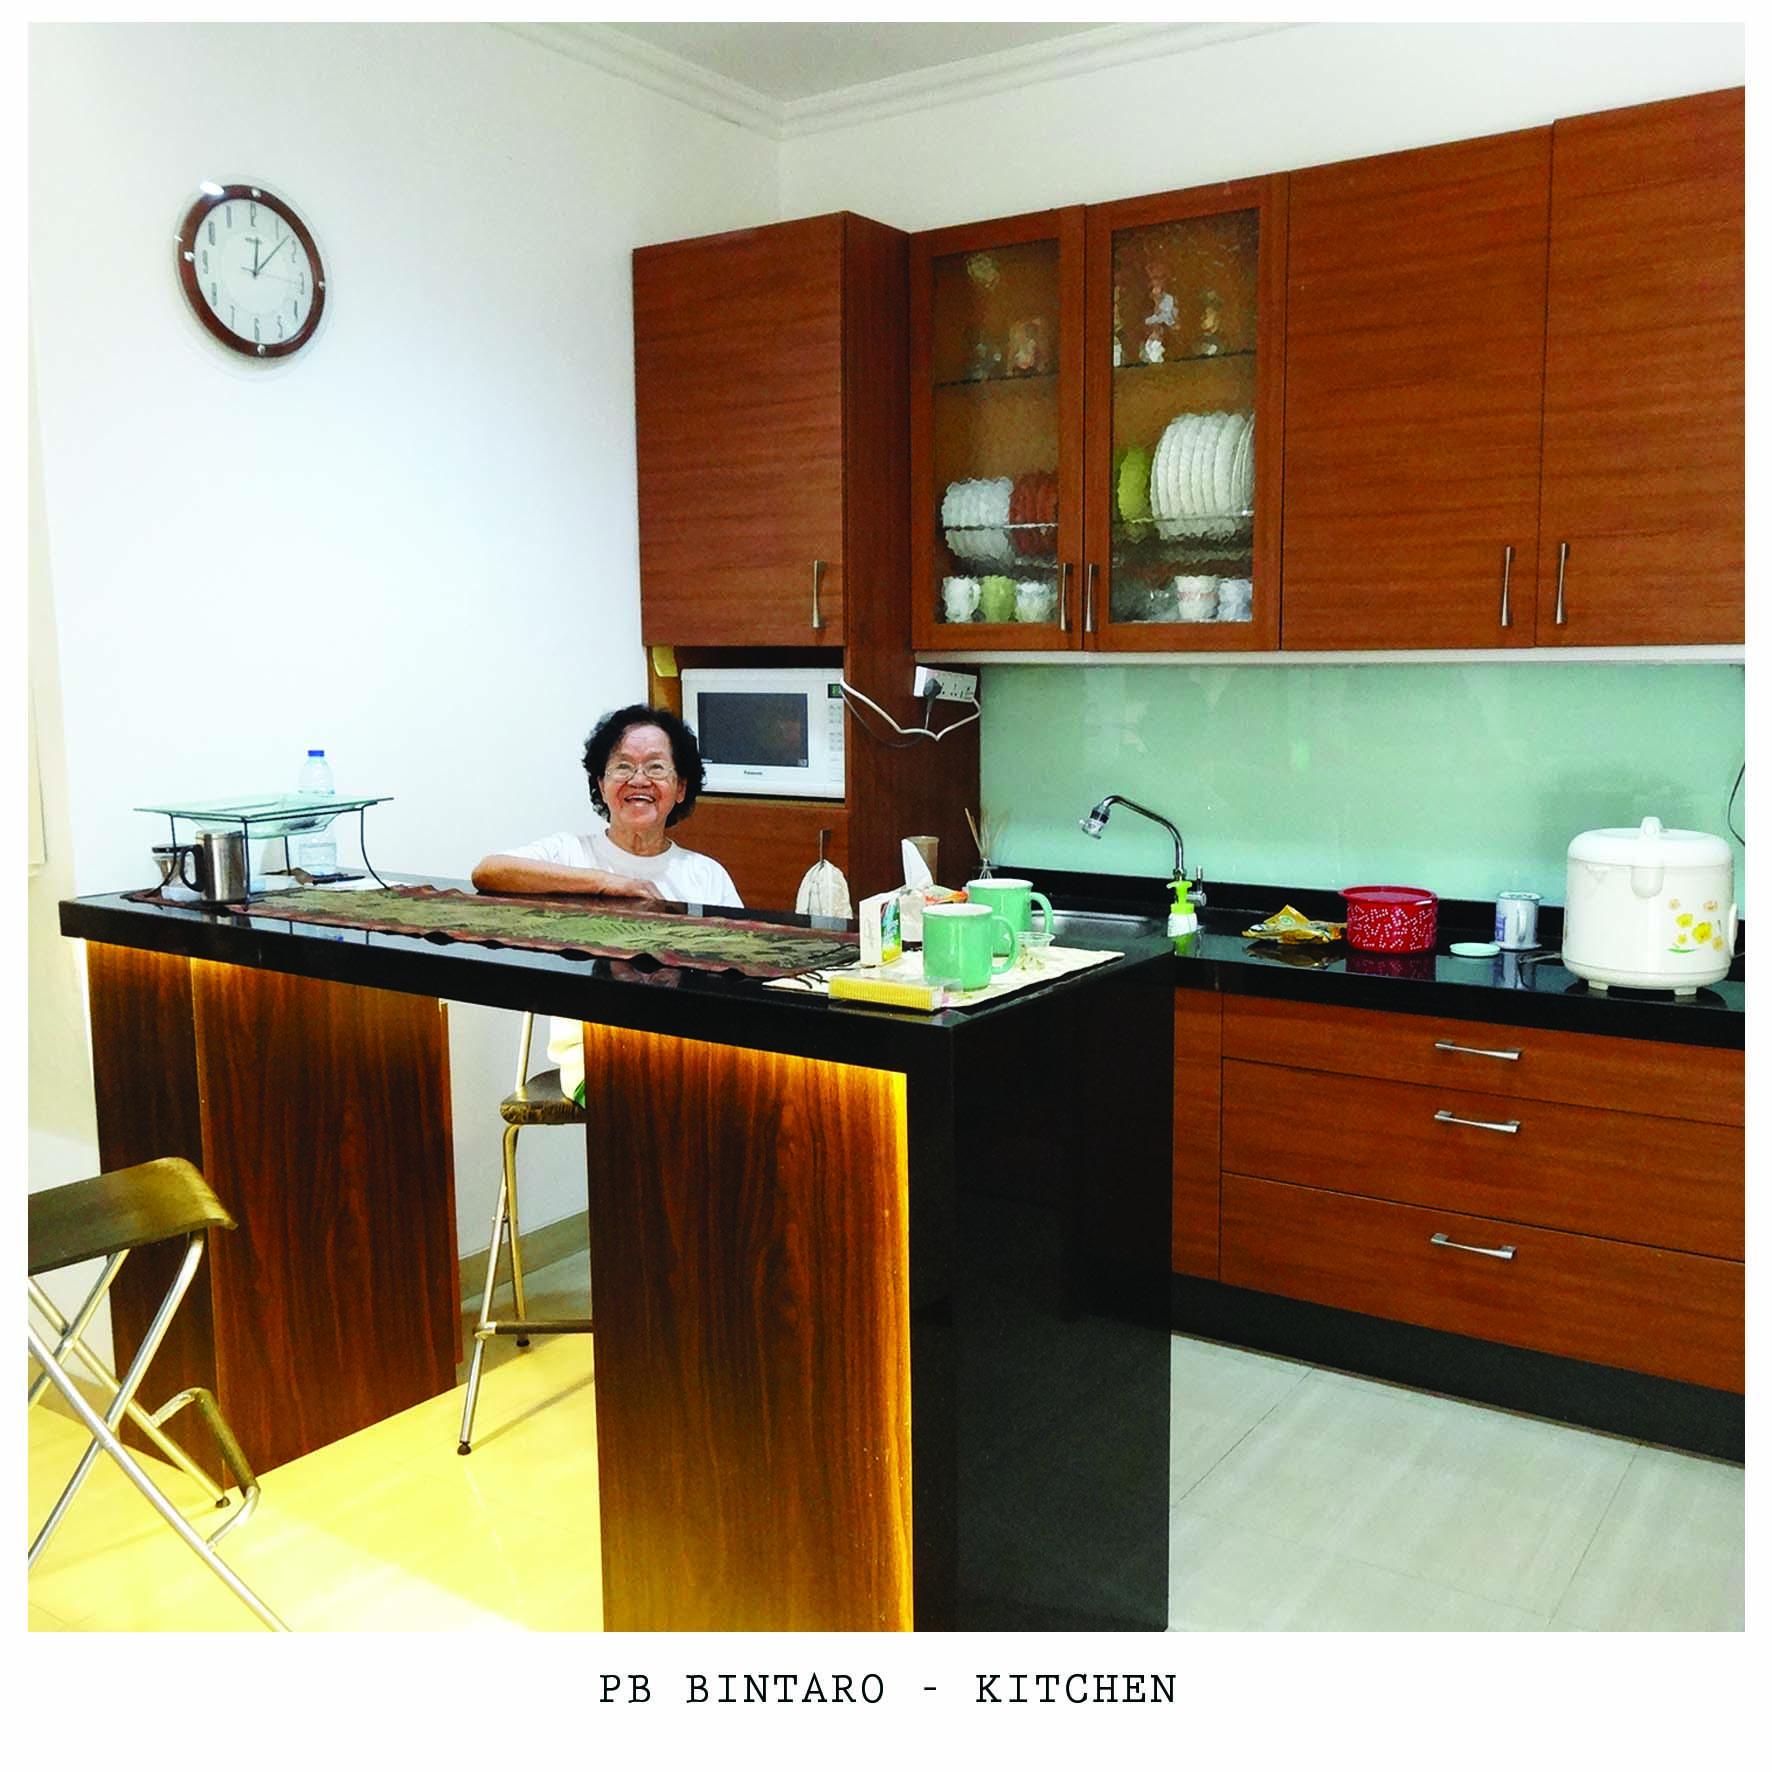 X3M Architects Pb 6 House Bintaro Bintaro X3M-Architects-Pb-6-House  75954